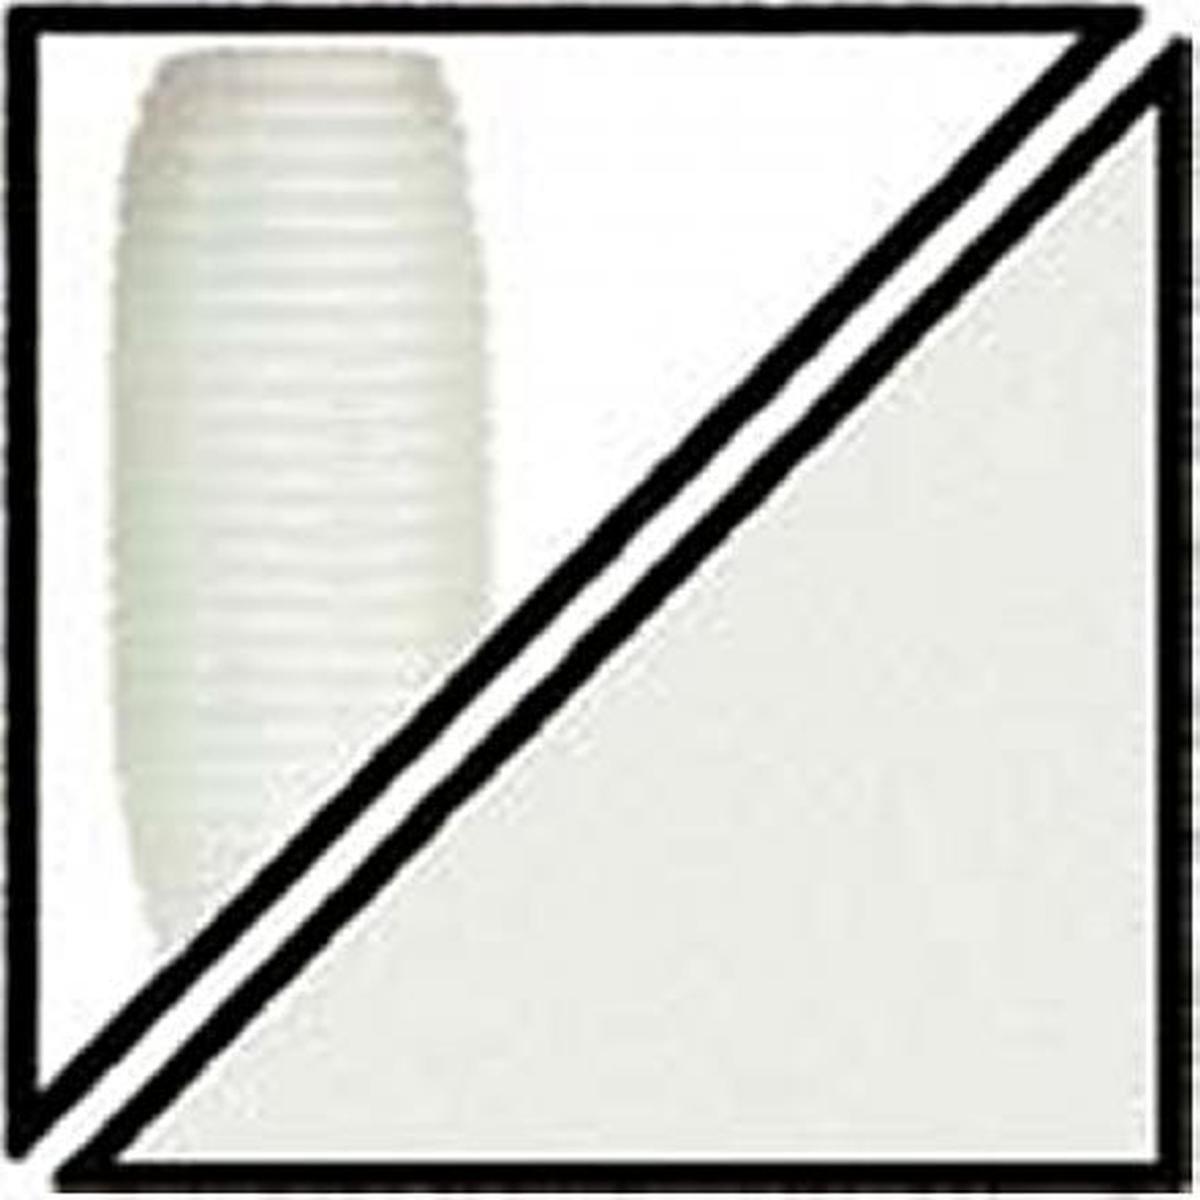 【国内即発送】 Yamamoto Single Tail Bait Grub Bait Luminous B0096BNLQY 4-Inch|Luminous White 4-Inch Luminous White 4-Inch, ウチタチョウ:50b2adde --- arianechie.dominiotemporario.com